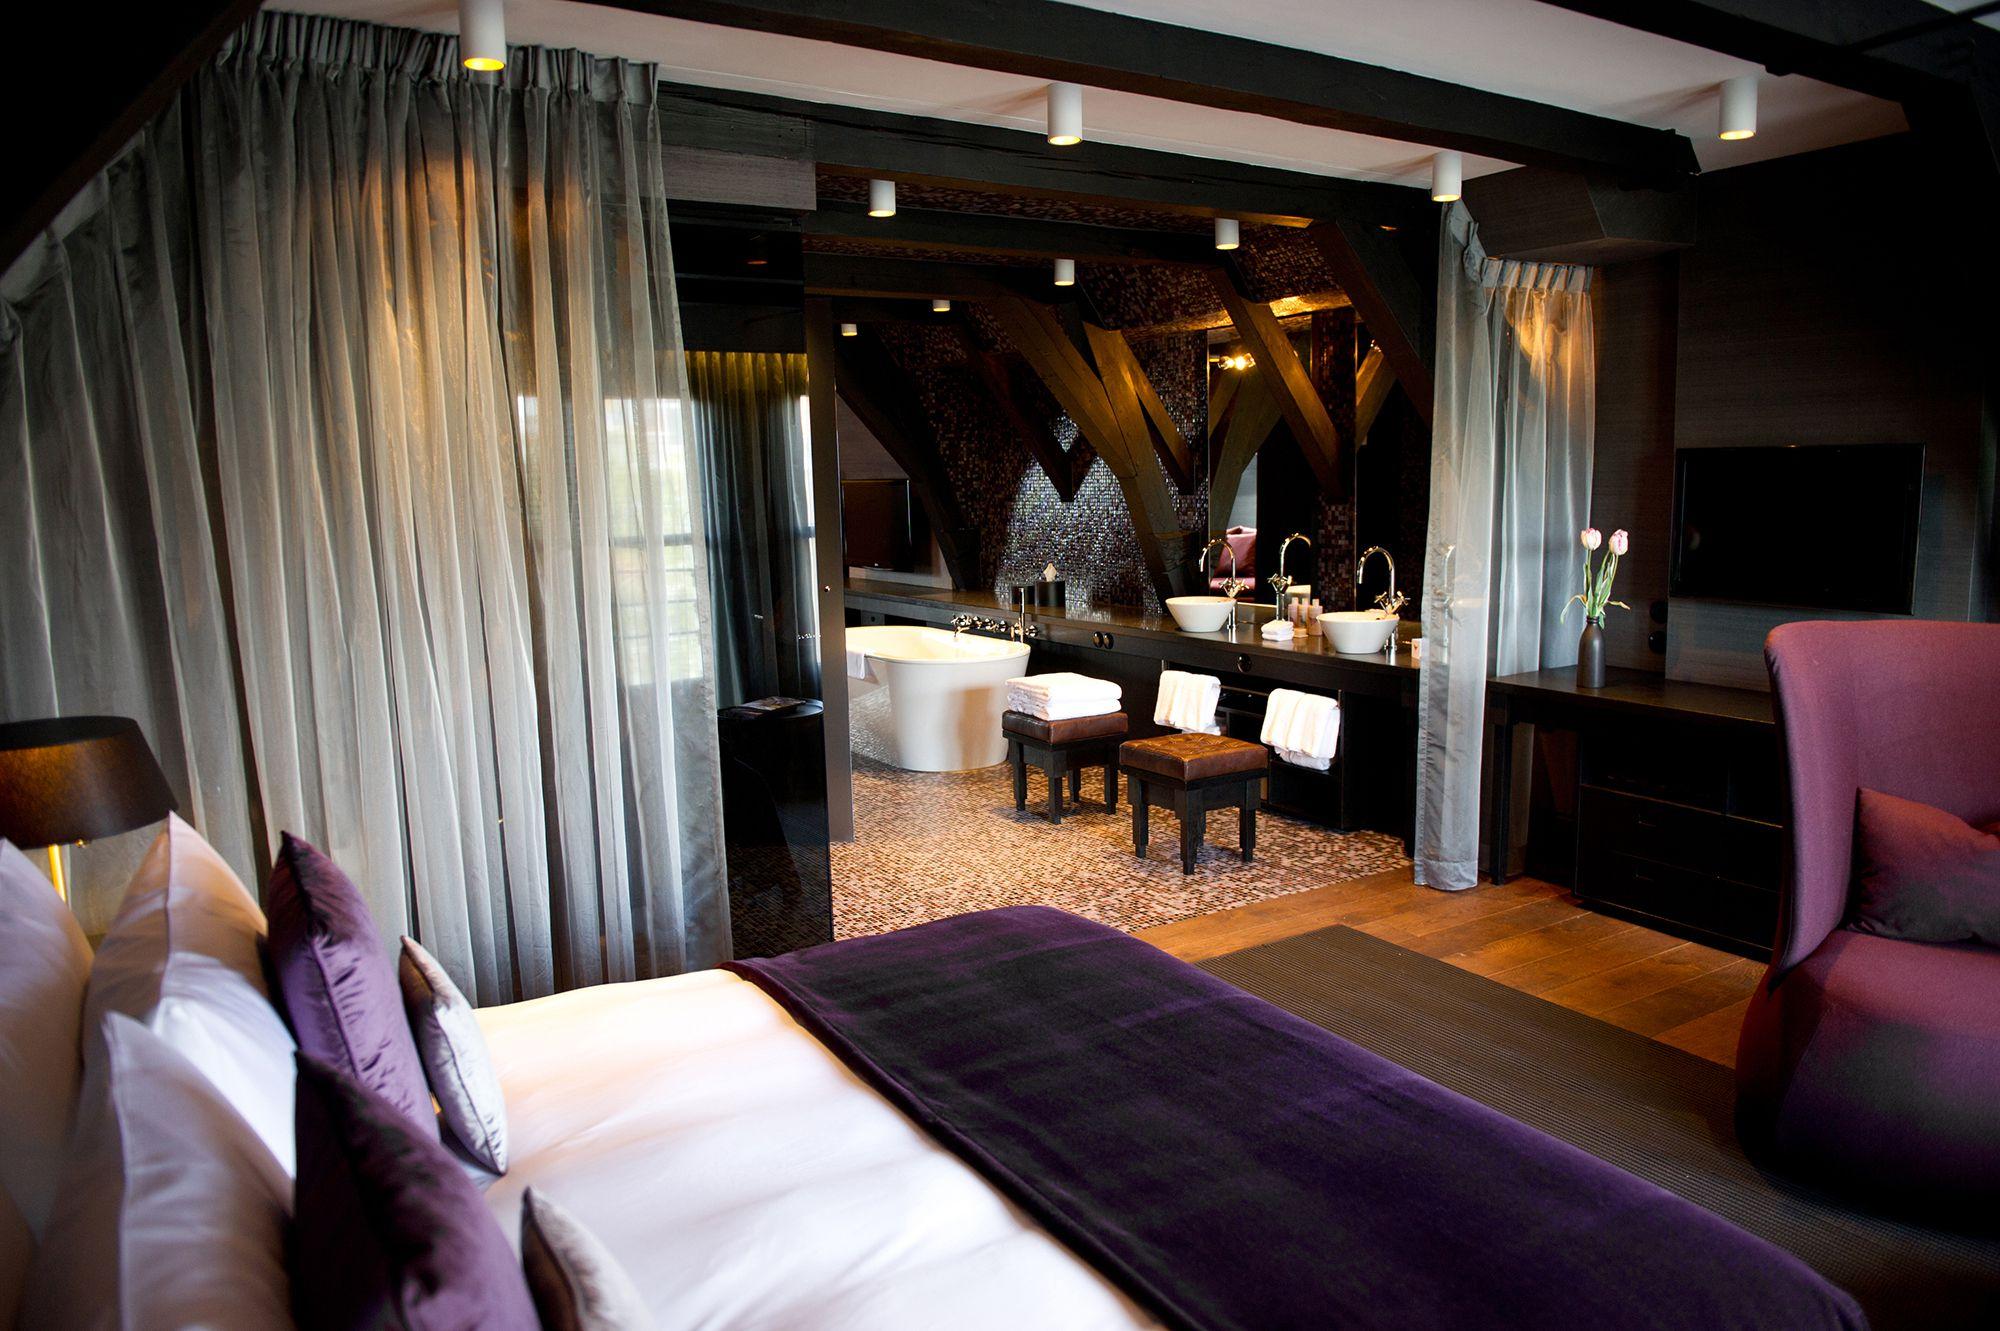 best room 1 - © amy murrell